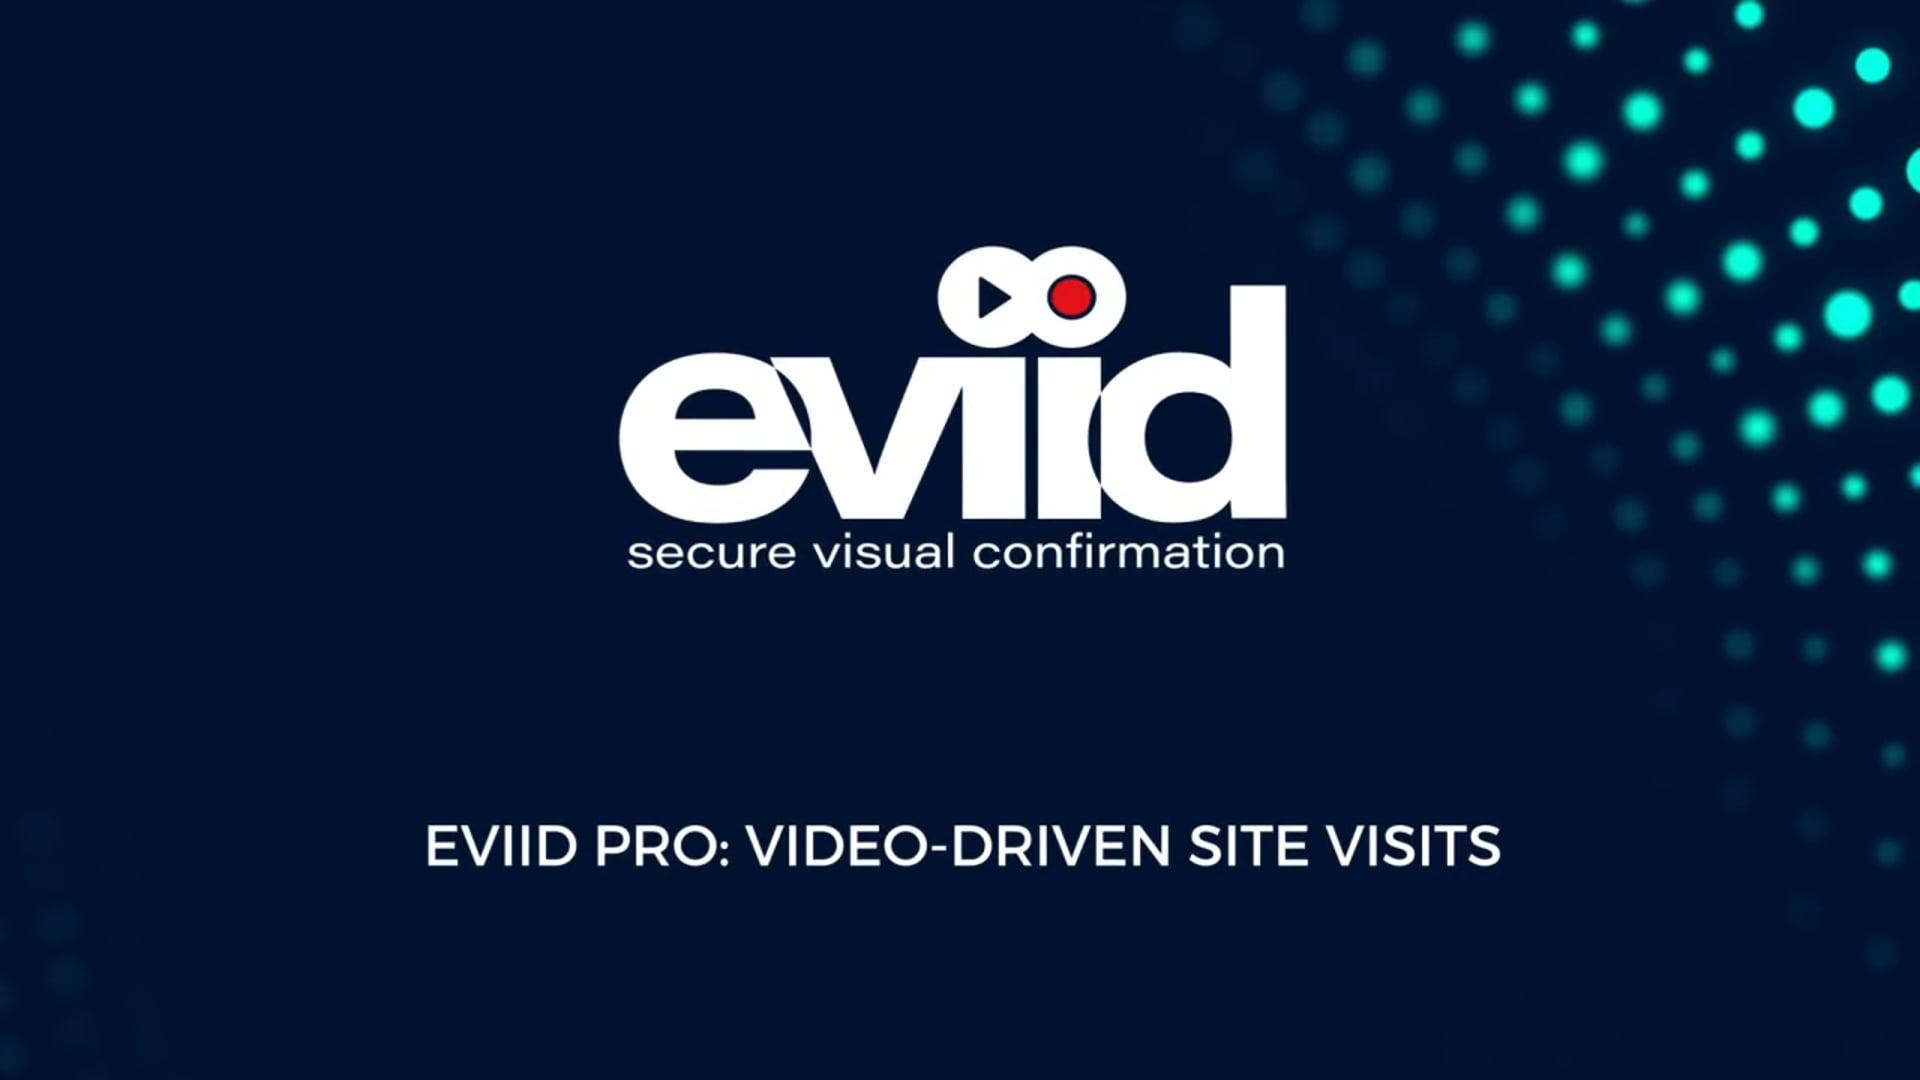 eviid Pro: Video driven site visits